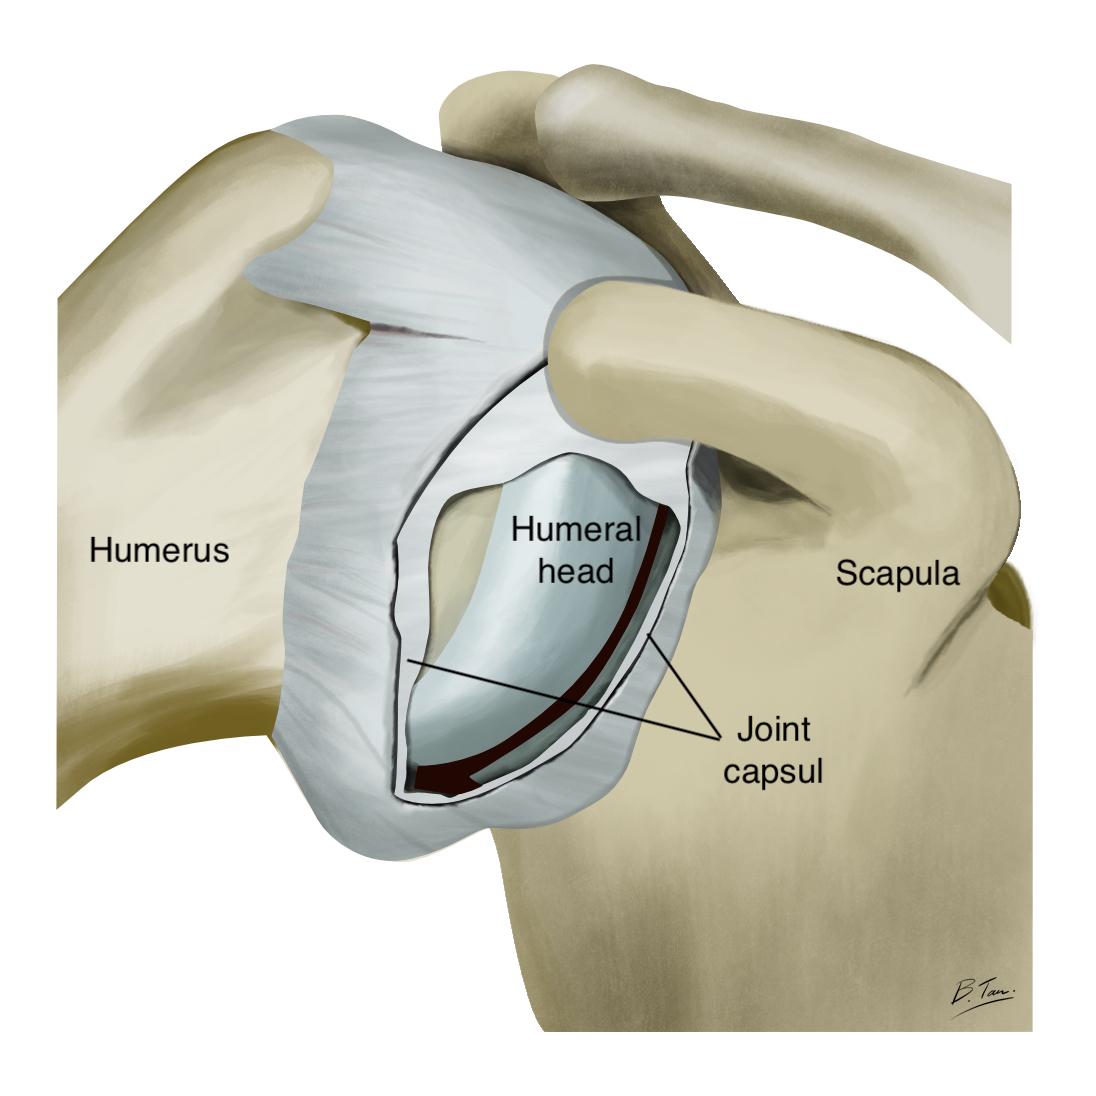 Normal shoulder capsule